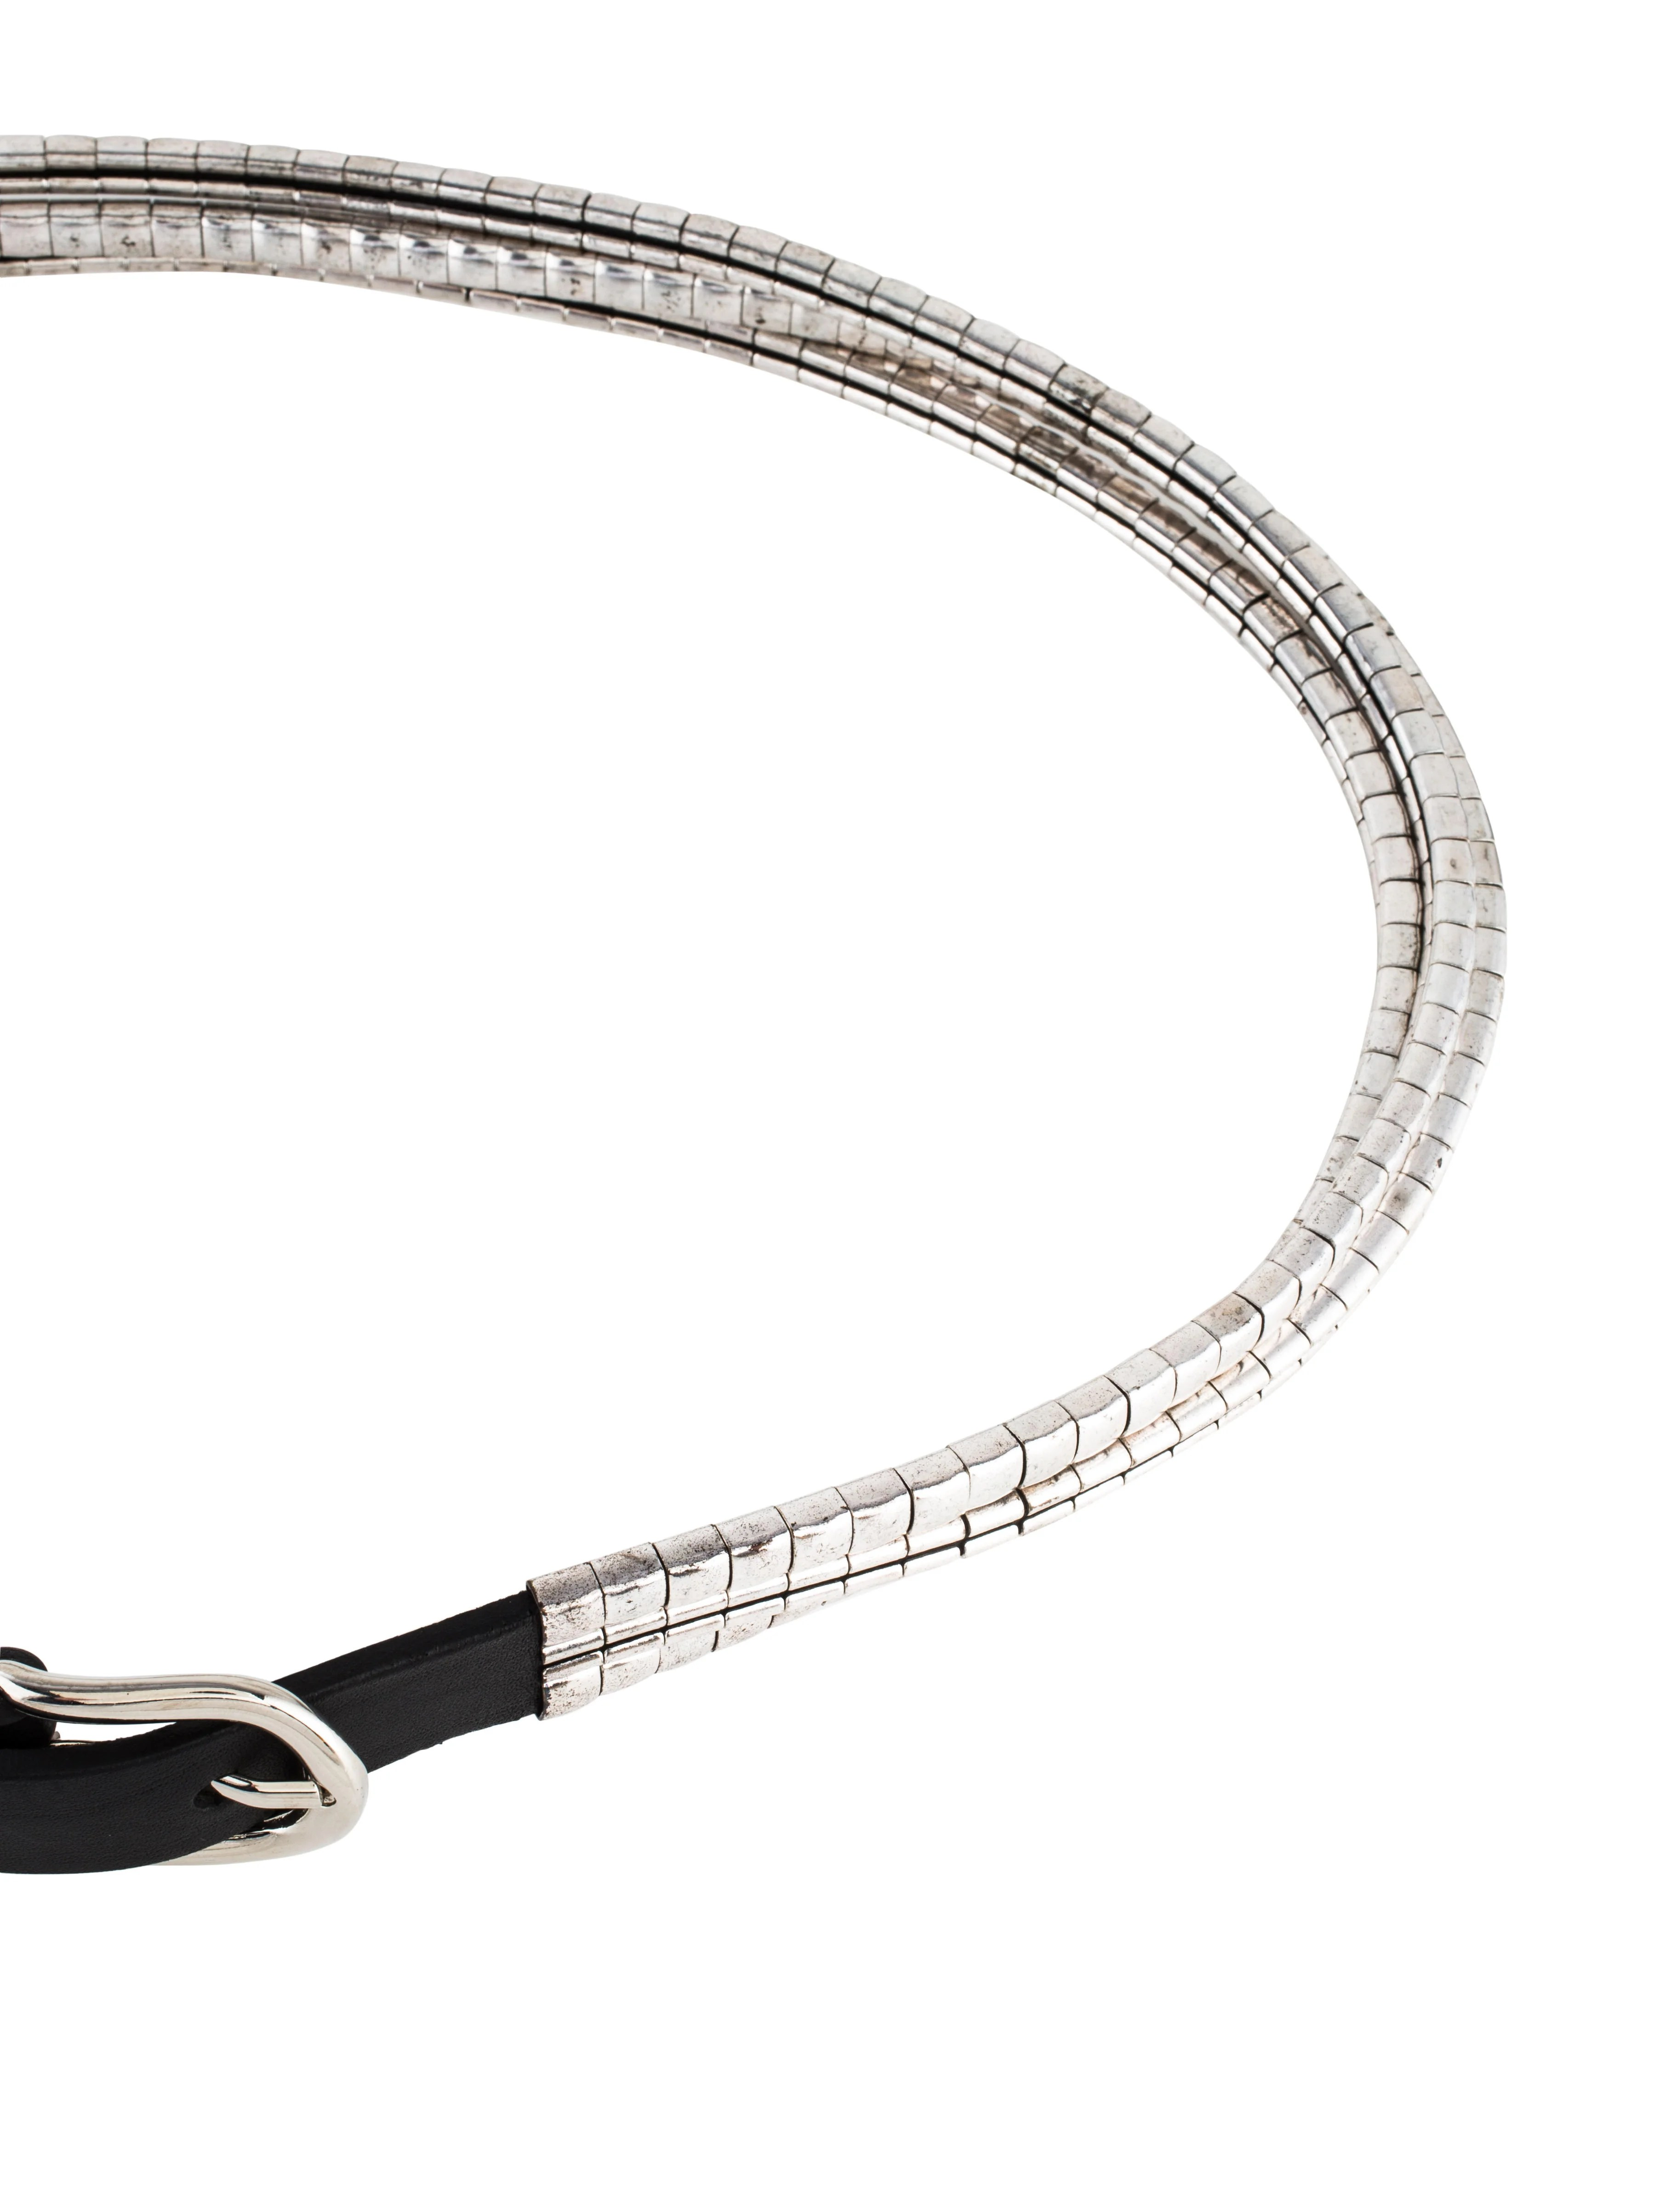 Isabel Marant Leather Chain Link Belt